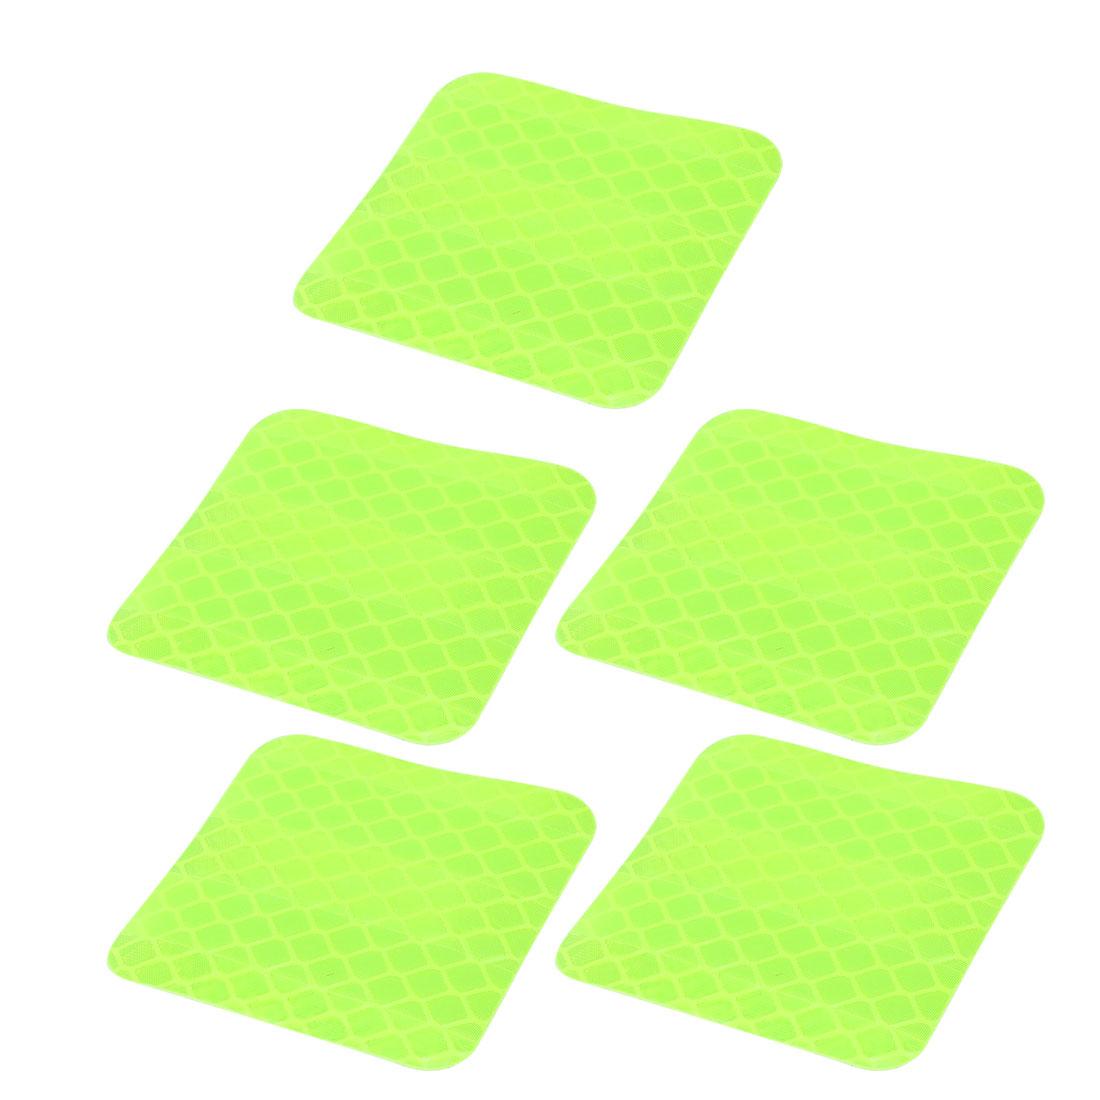 5pcs Honeycomb Reflective Warning Tape Film Sticker Light Yellow 40mm x 40mm